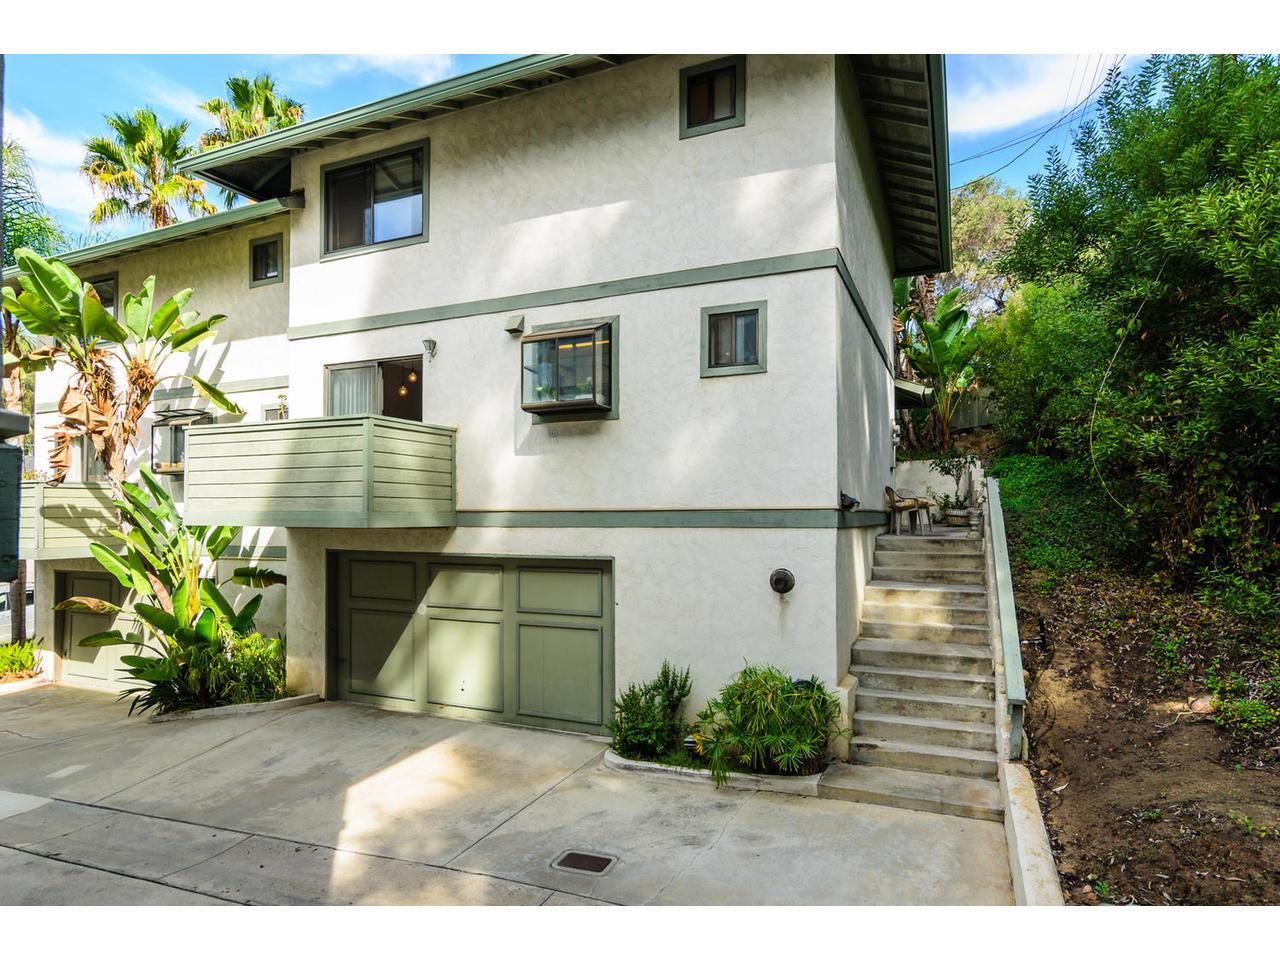 3579 Curlew Street San Diego-MLS_Size-003-3579 Curlew Street San Diego-1280x960-72dpi.jpg